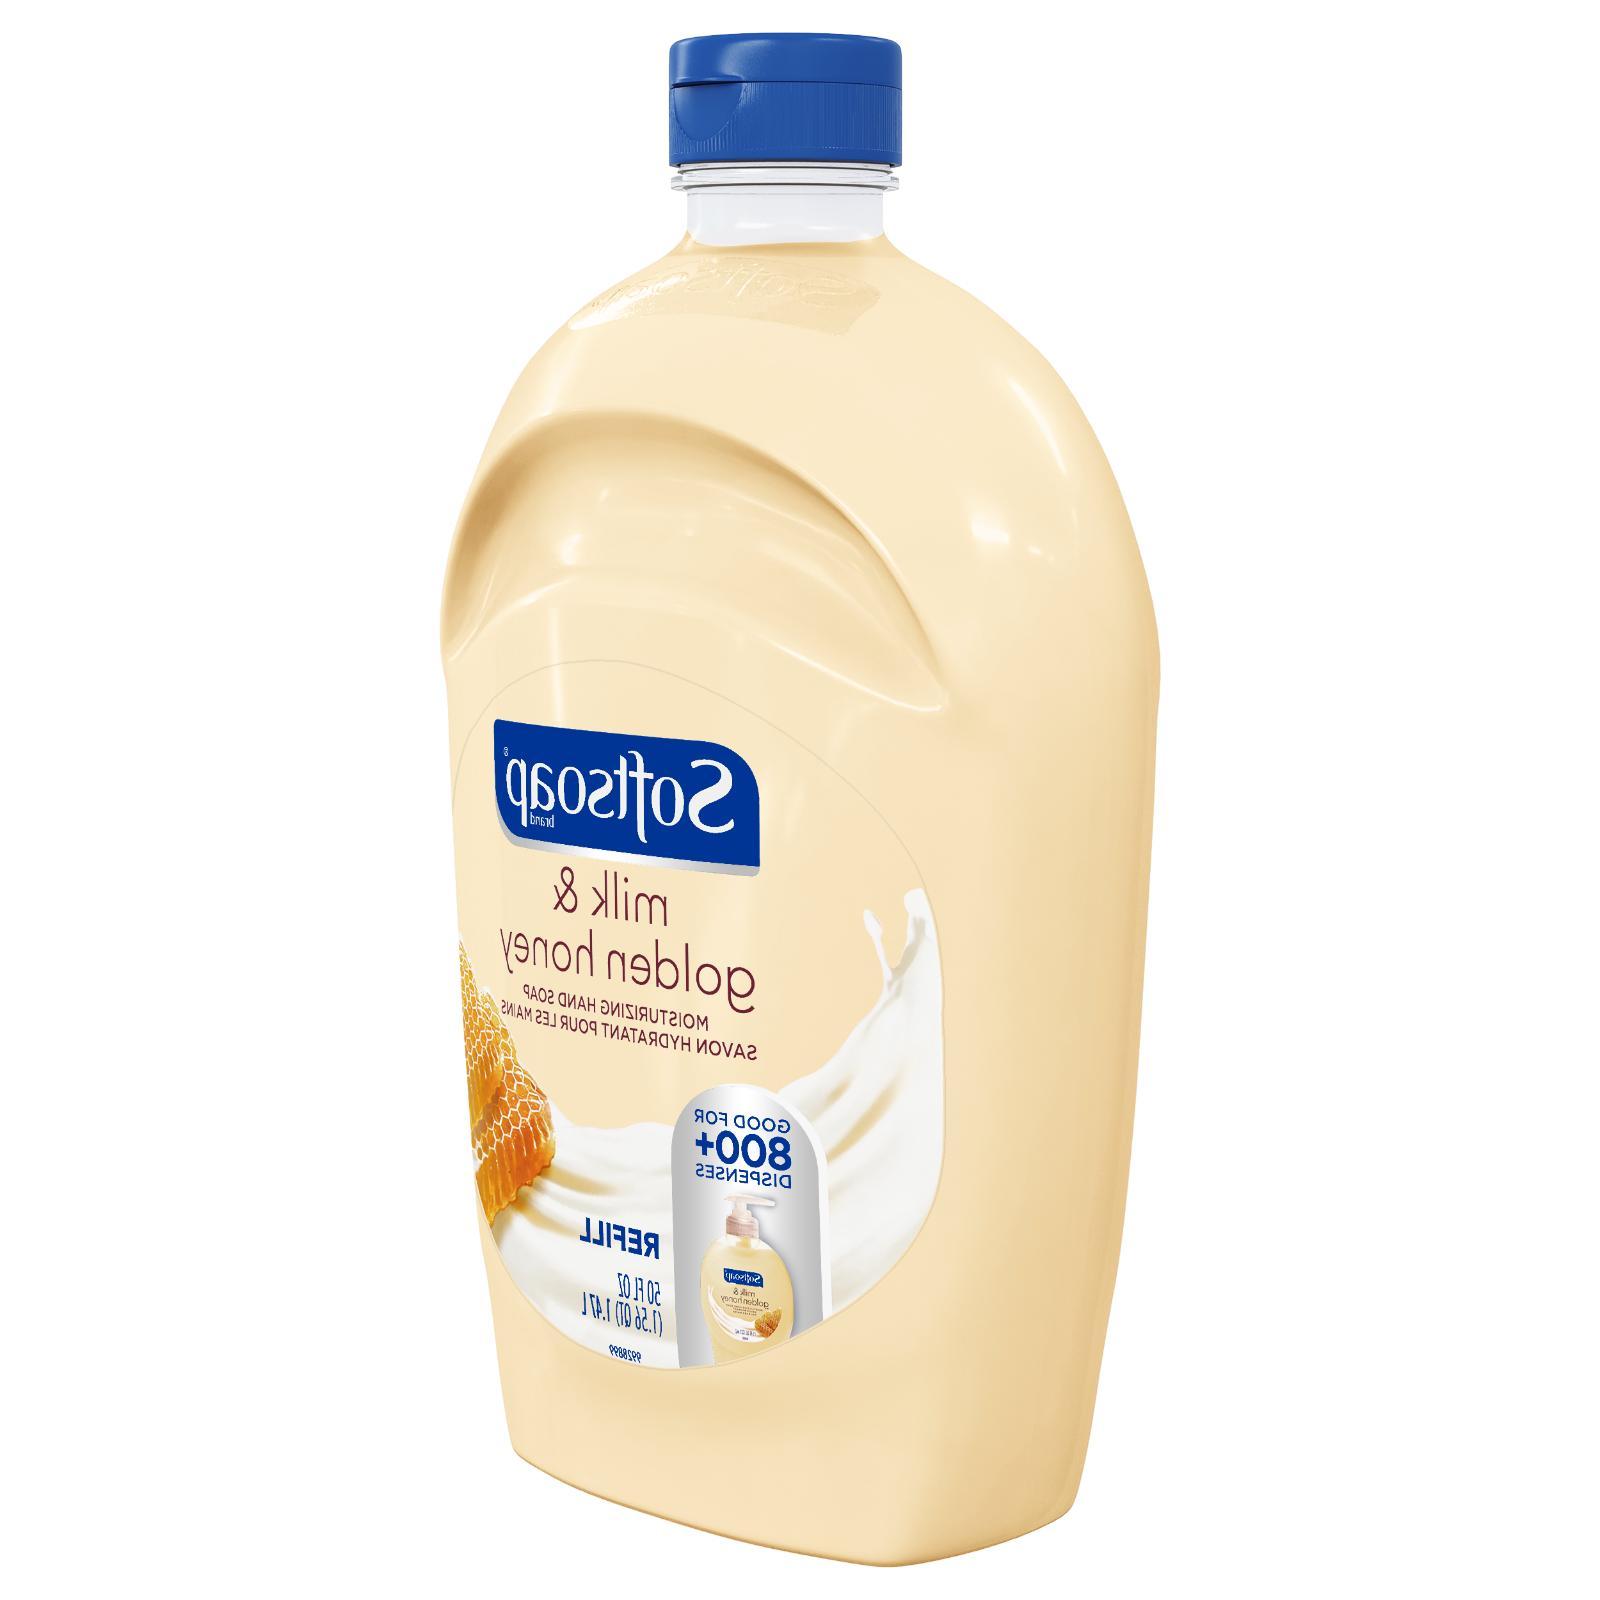 Softsoap Soap Milk Golden Honey, 50 Oz